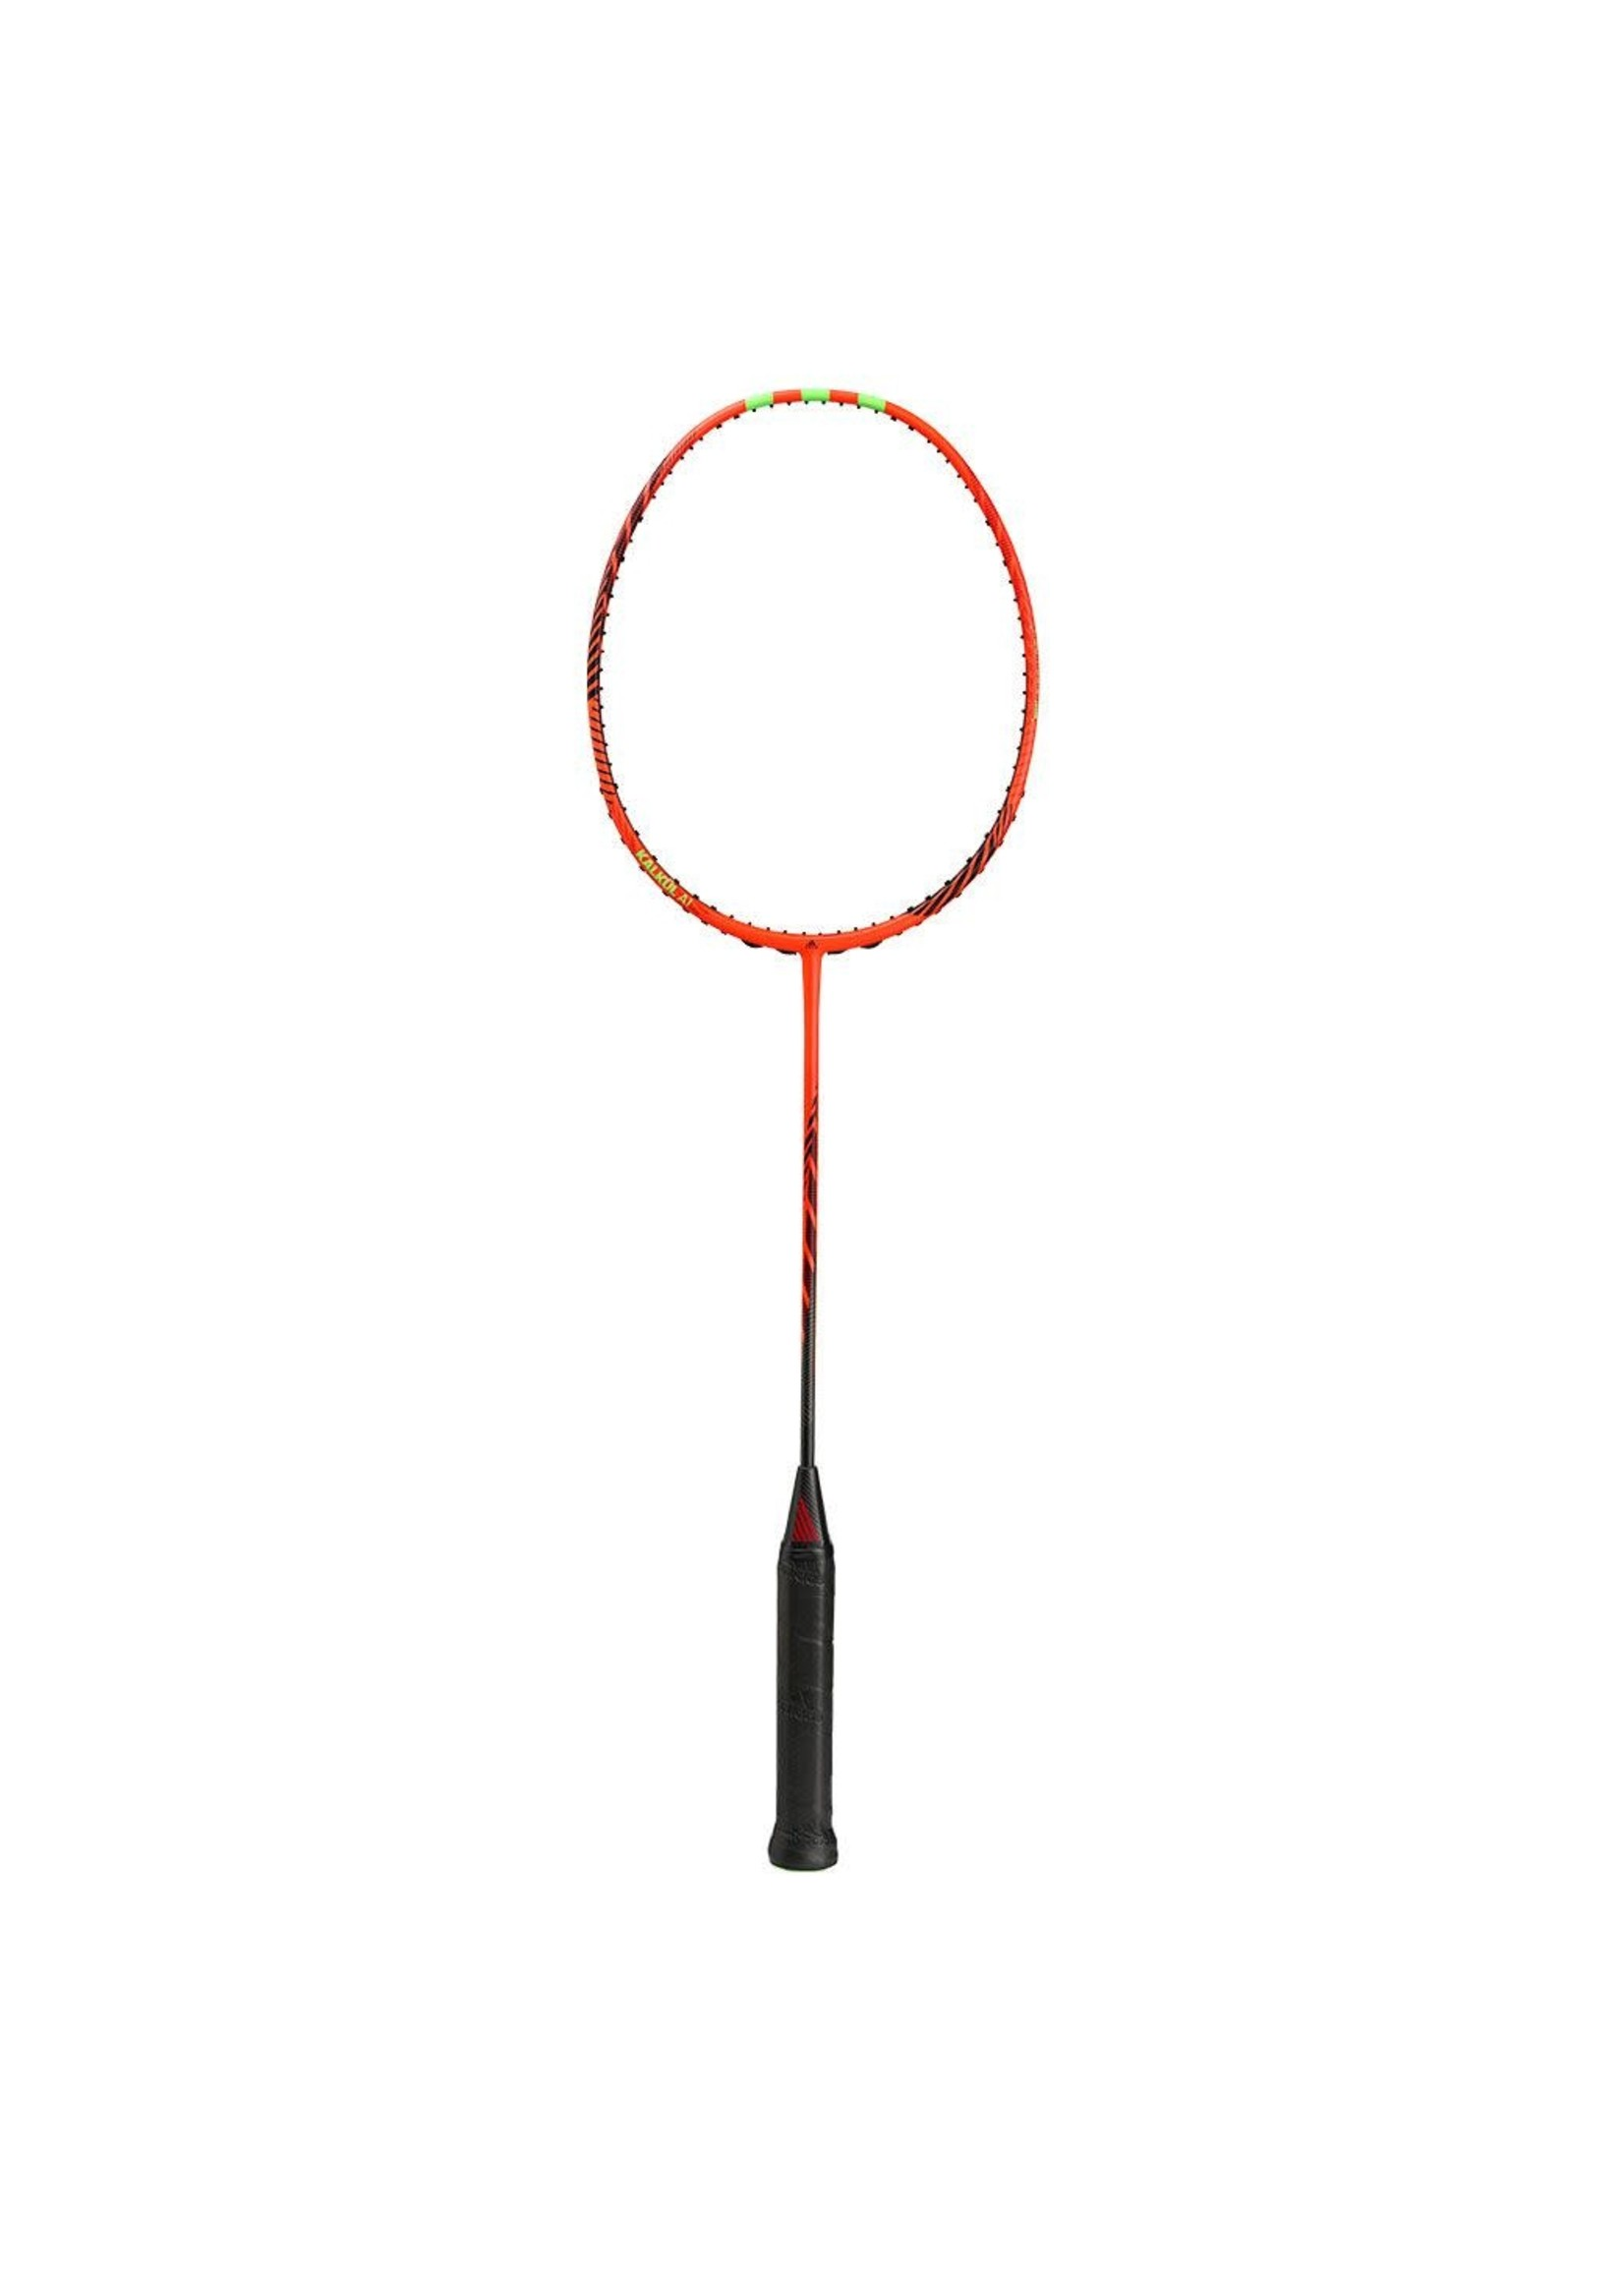 Adidas Adidas Kalkul A1 Badminton Racket, Red/Orange (2019)